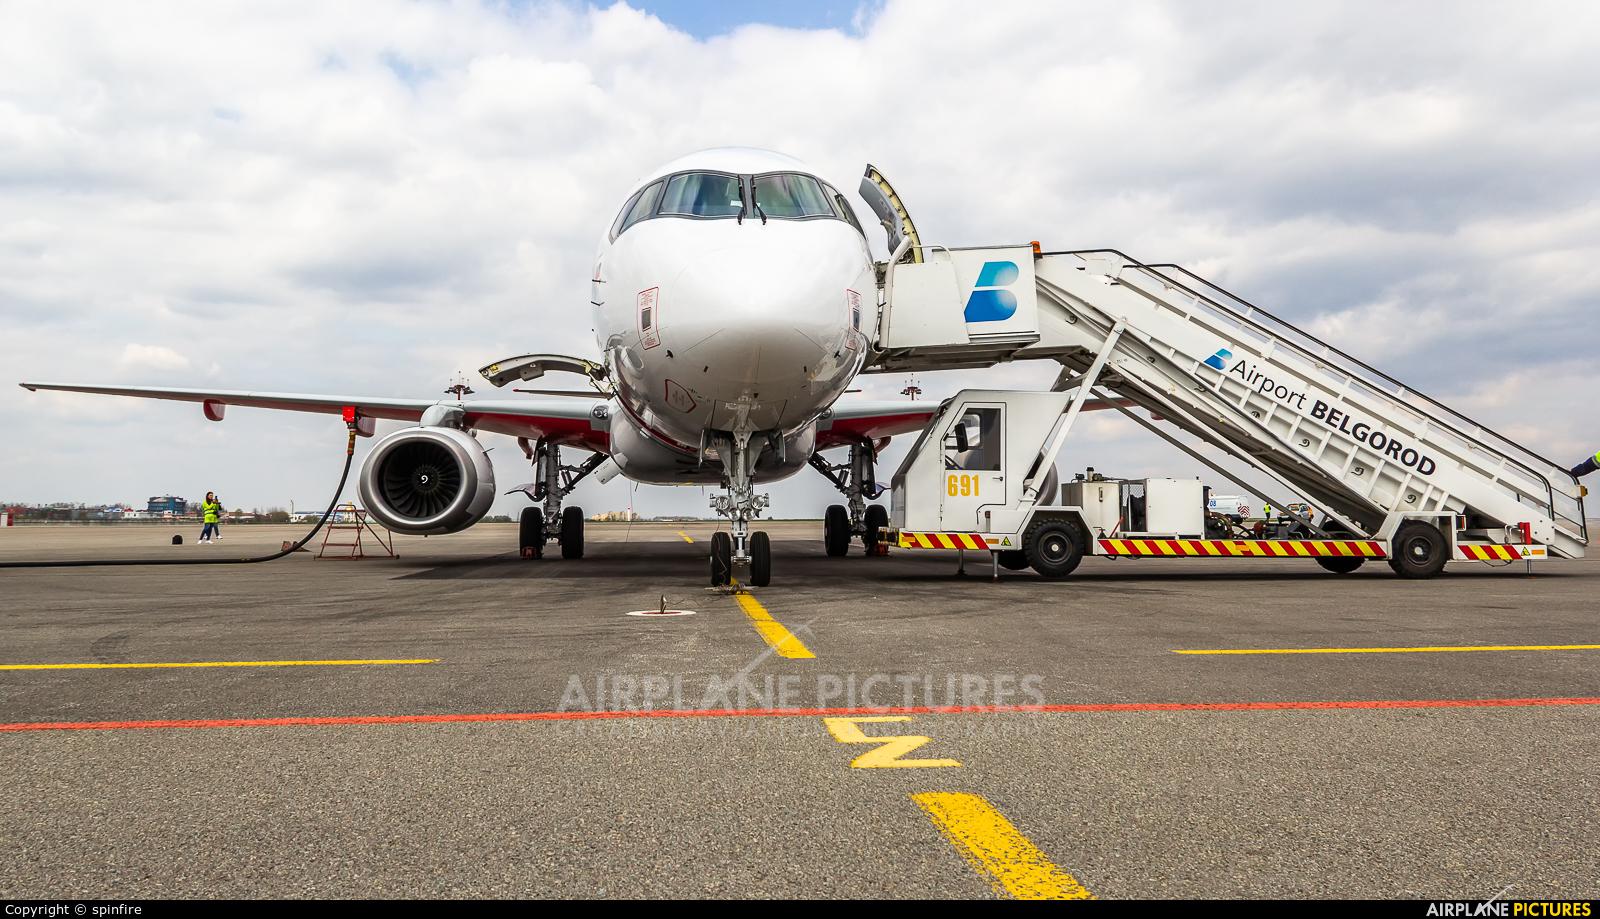 Red Wings RA-89144 aircraft at Belgorod Intl